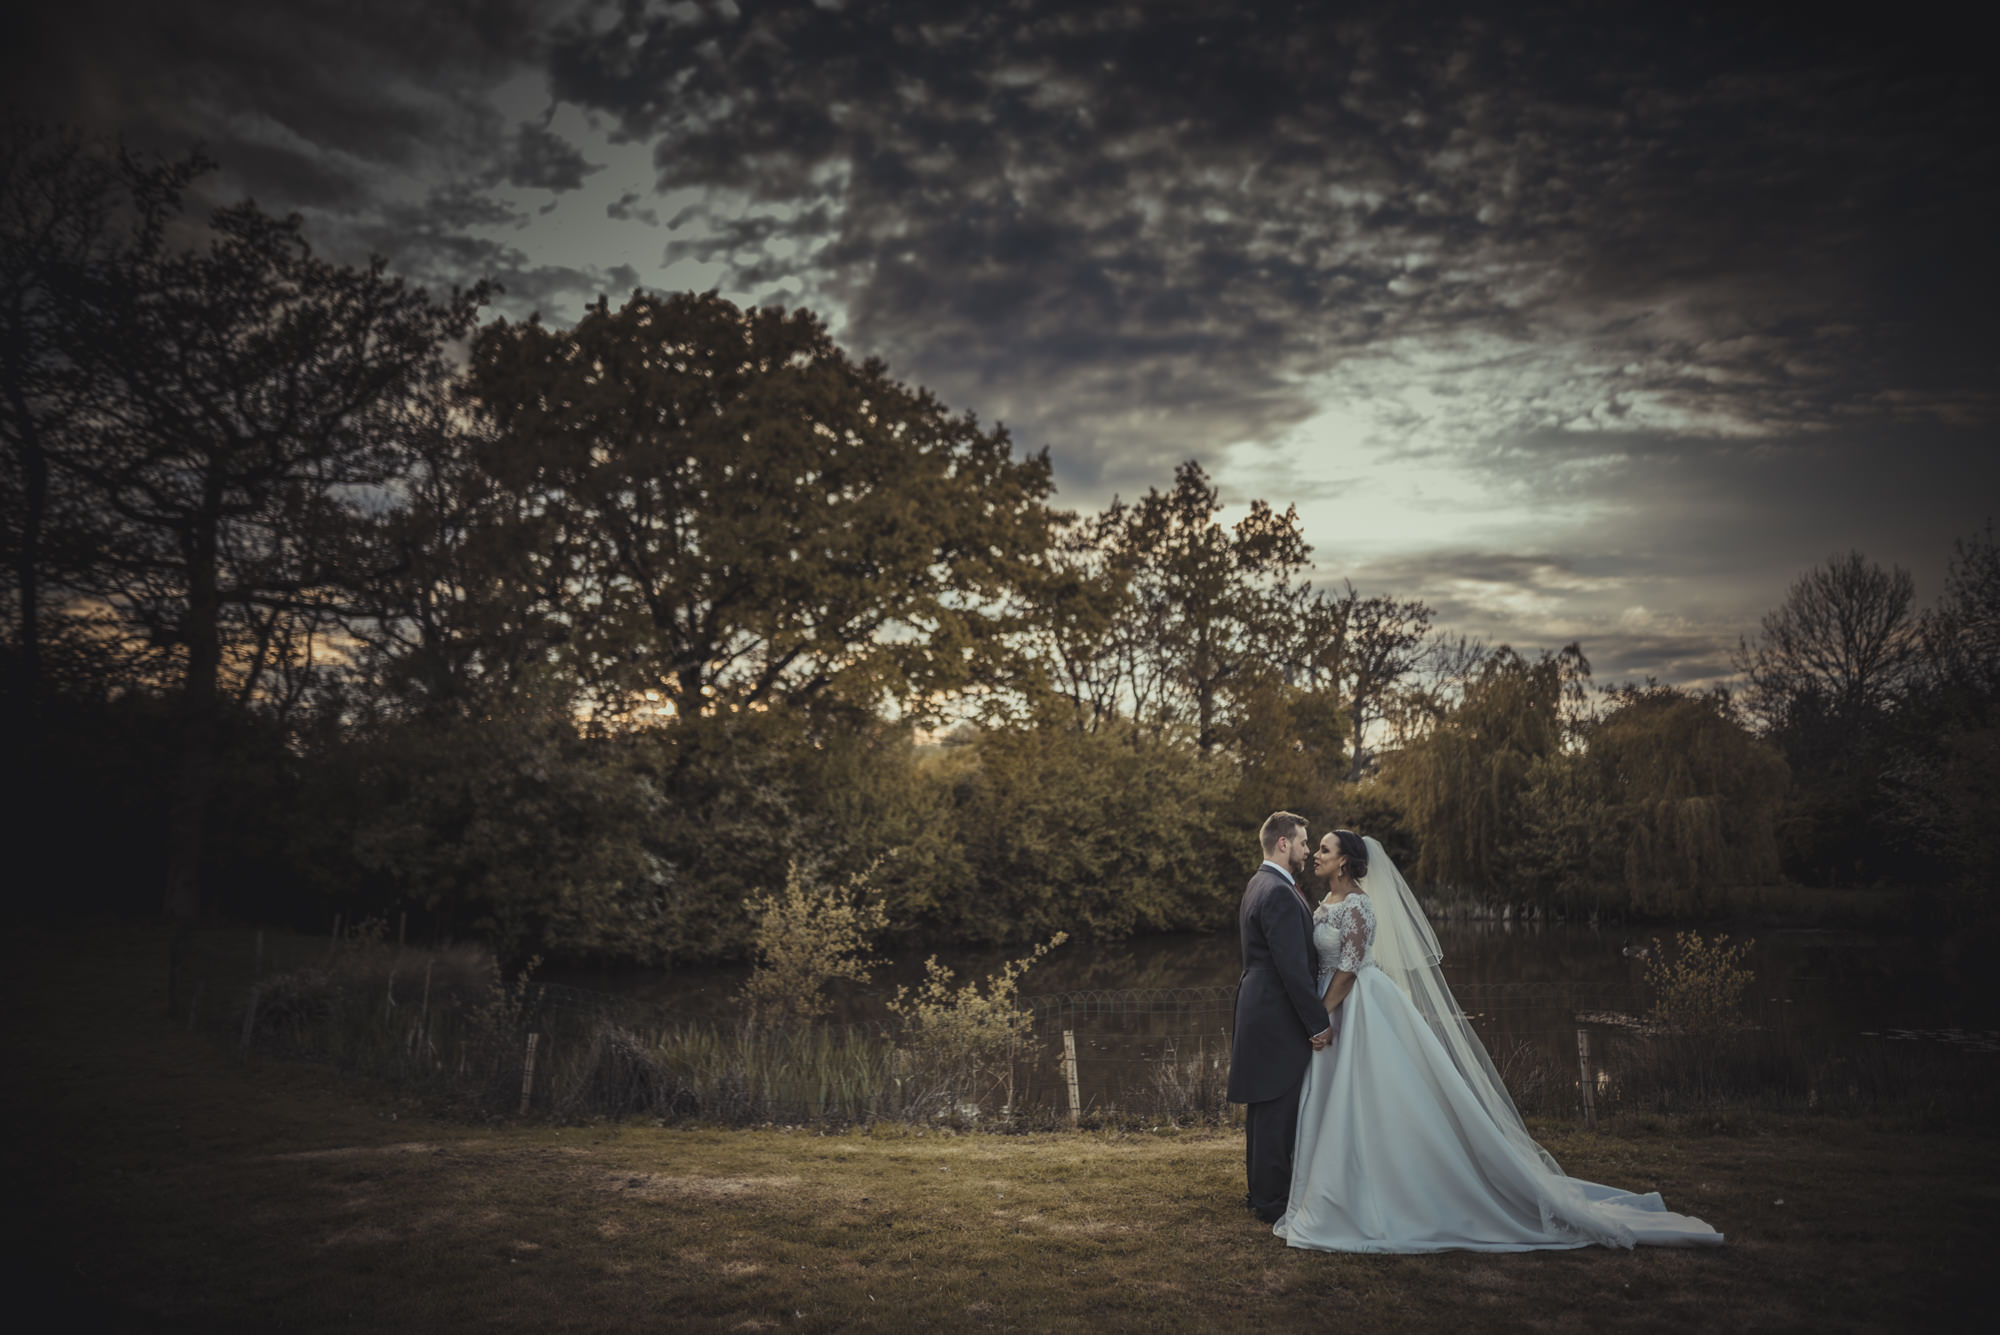 Jacqueline-Gareth-Wedding-Westmead-Events-Surrey-Manu-Mendoza-Wedding-Photography-490.jpg